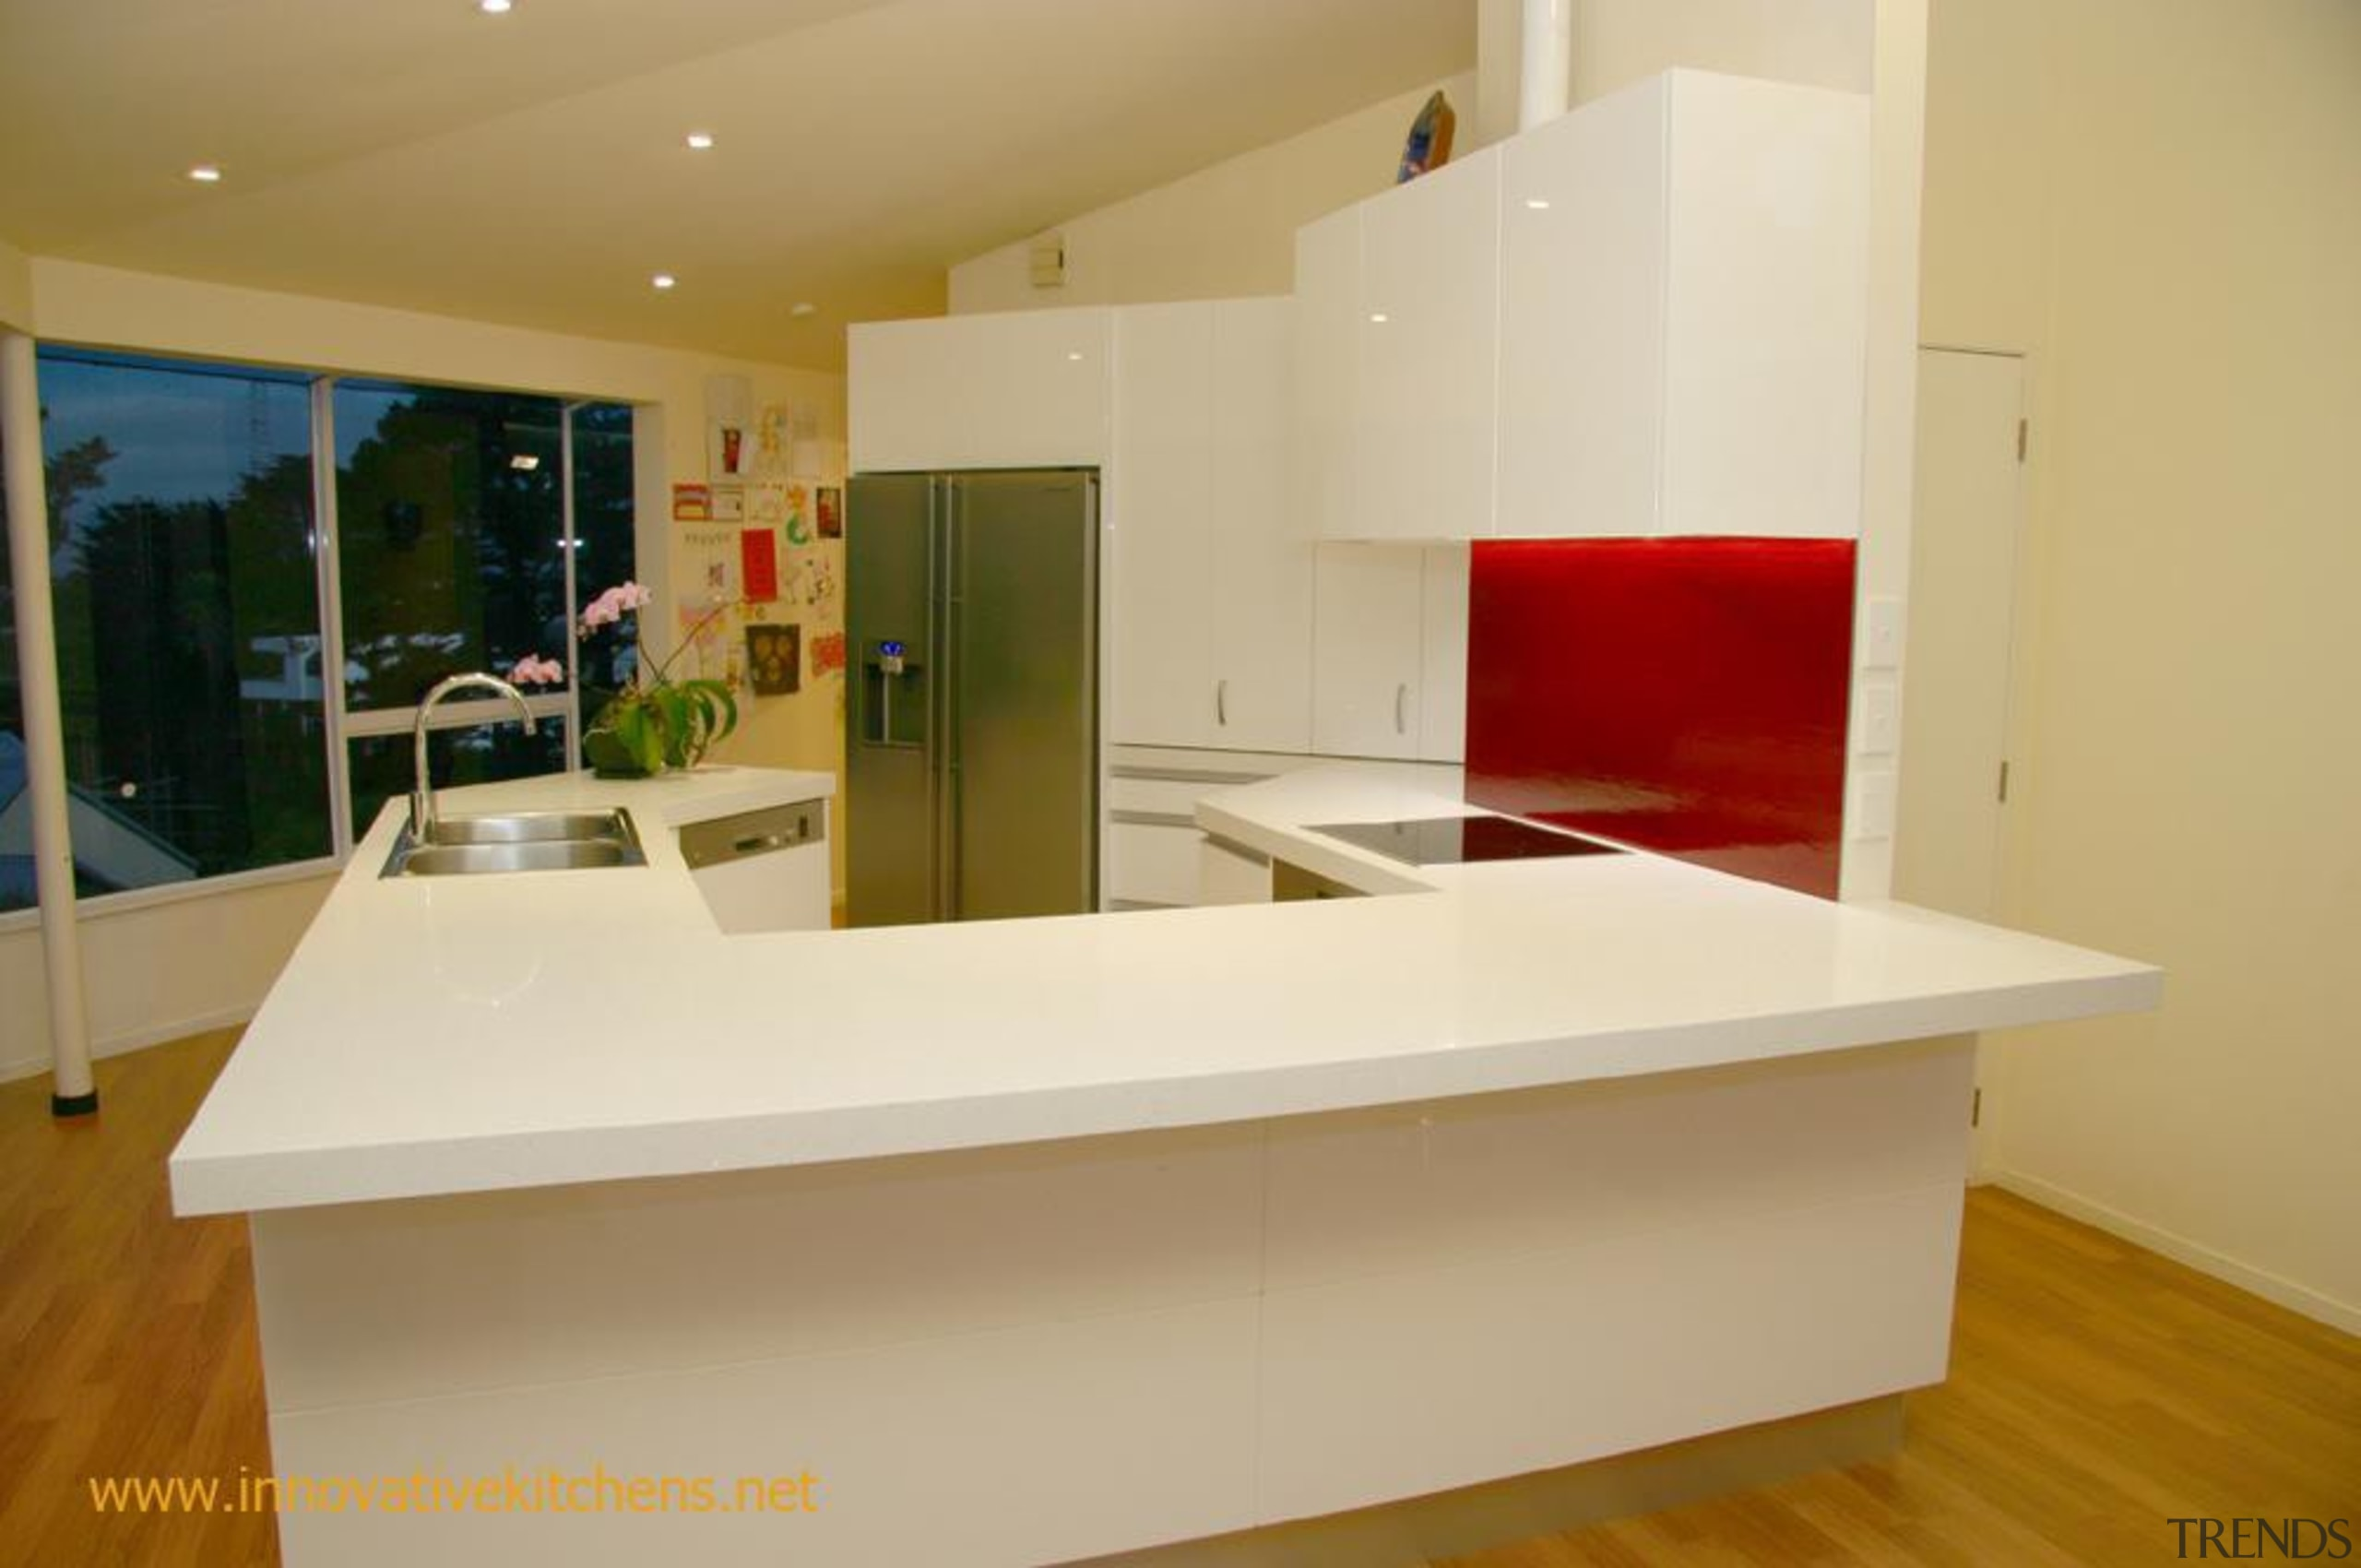 18 modern hillsborough 2012 2.jpg - 18_modern_hillsborough_2012_2.jpg - countertop, floor, furniture, interior design, kitchen, property, real estate, orange, brown